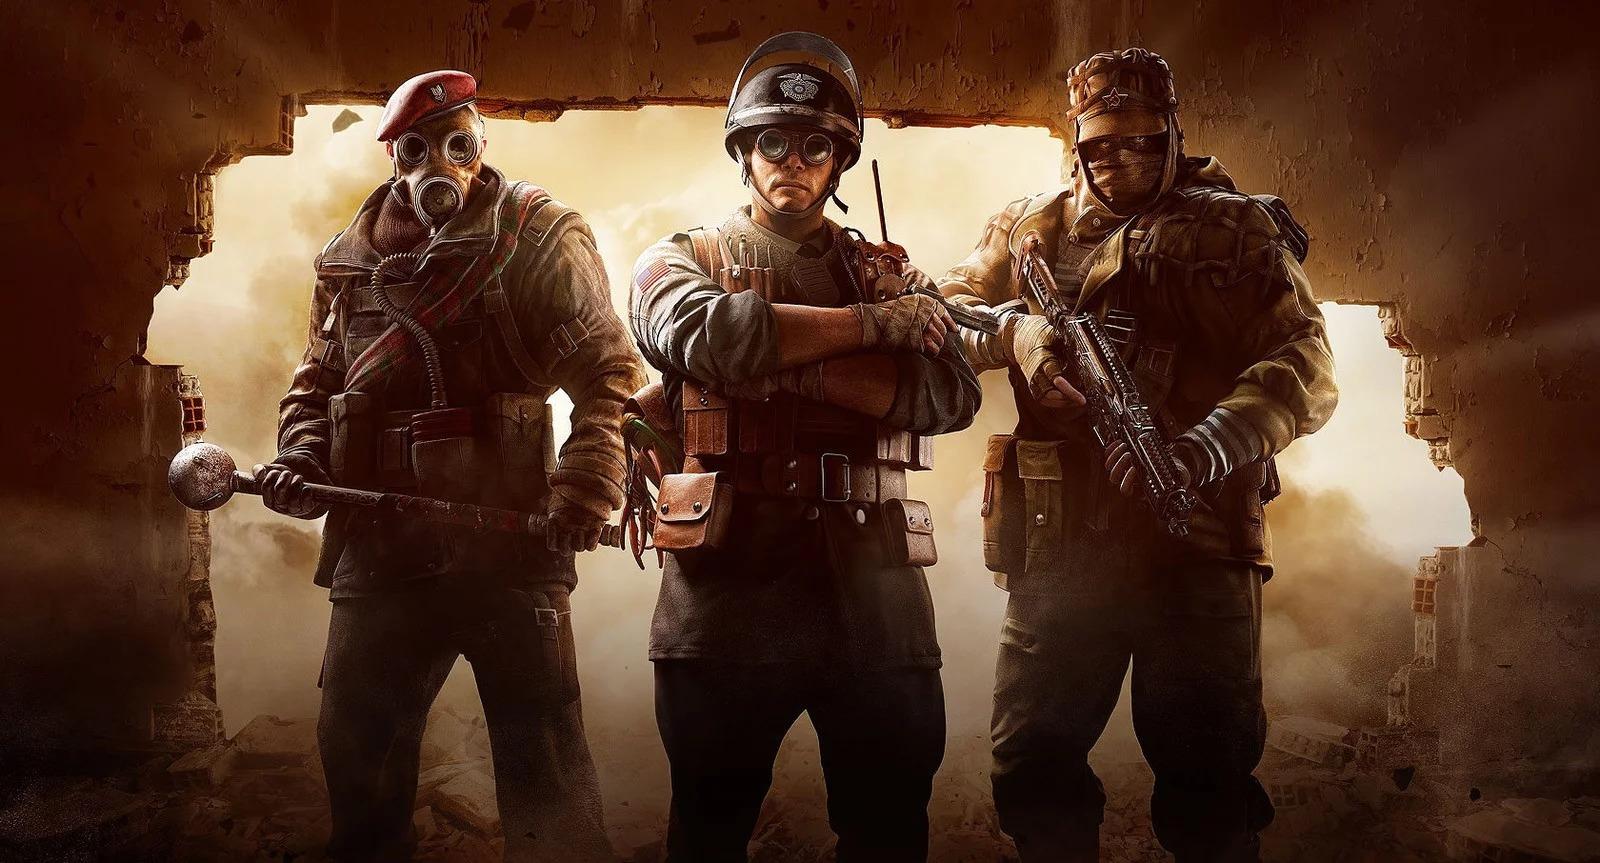 Rainbow Six Siege's newest operators look like Indiana Jones characters